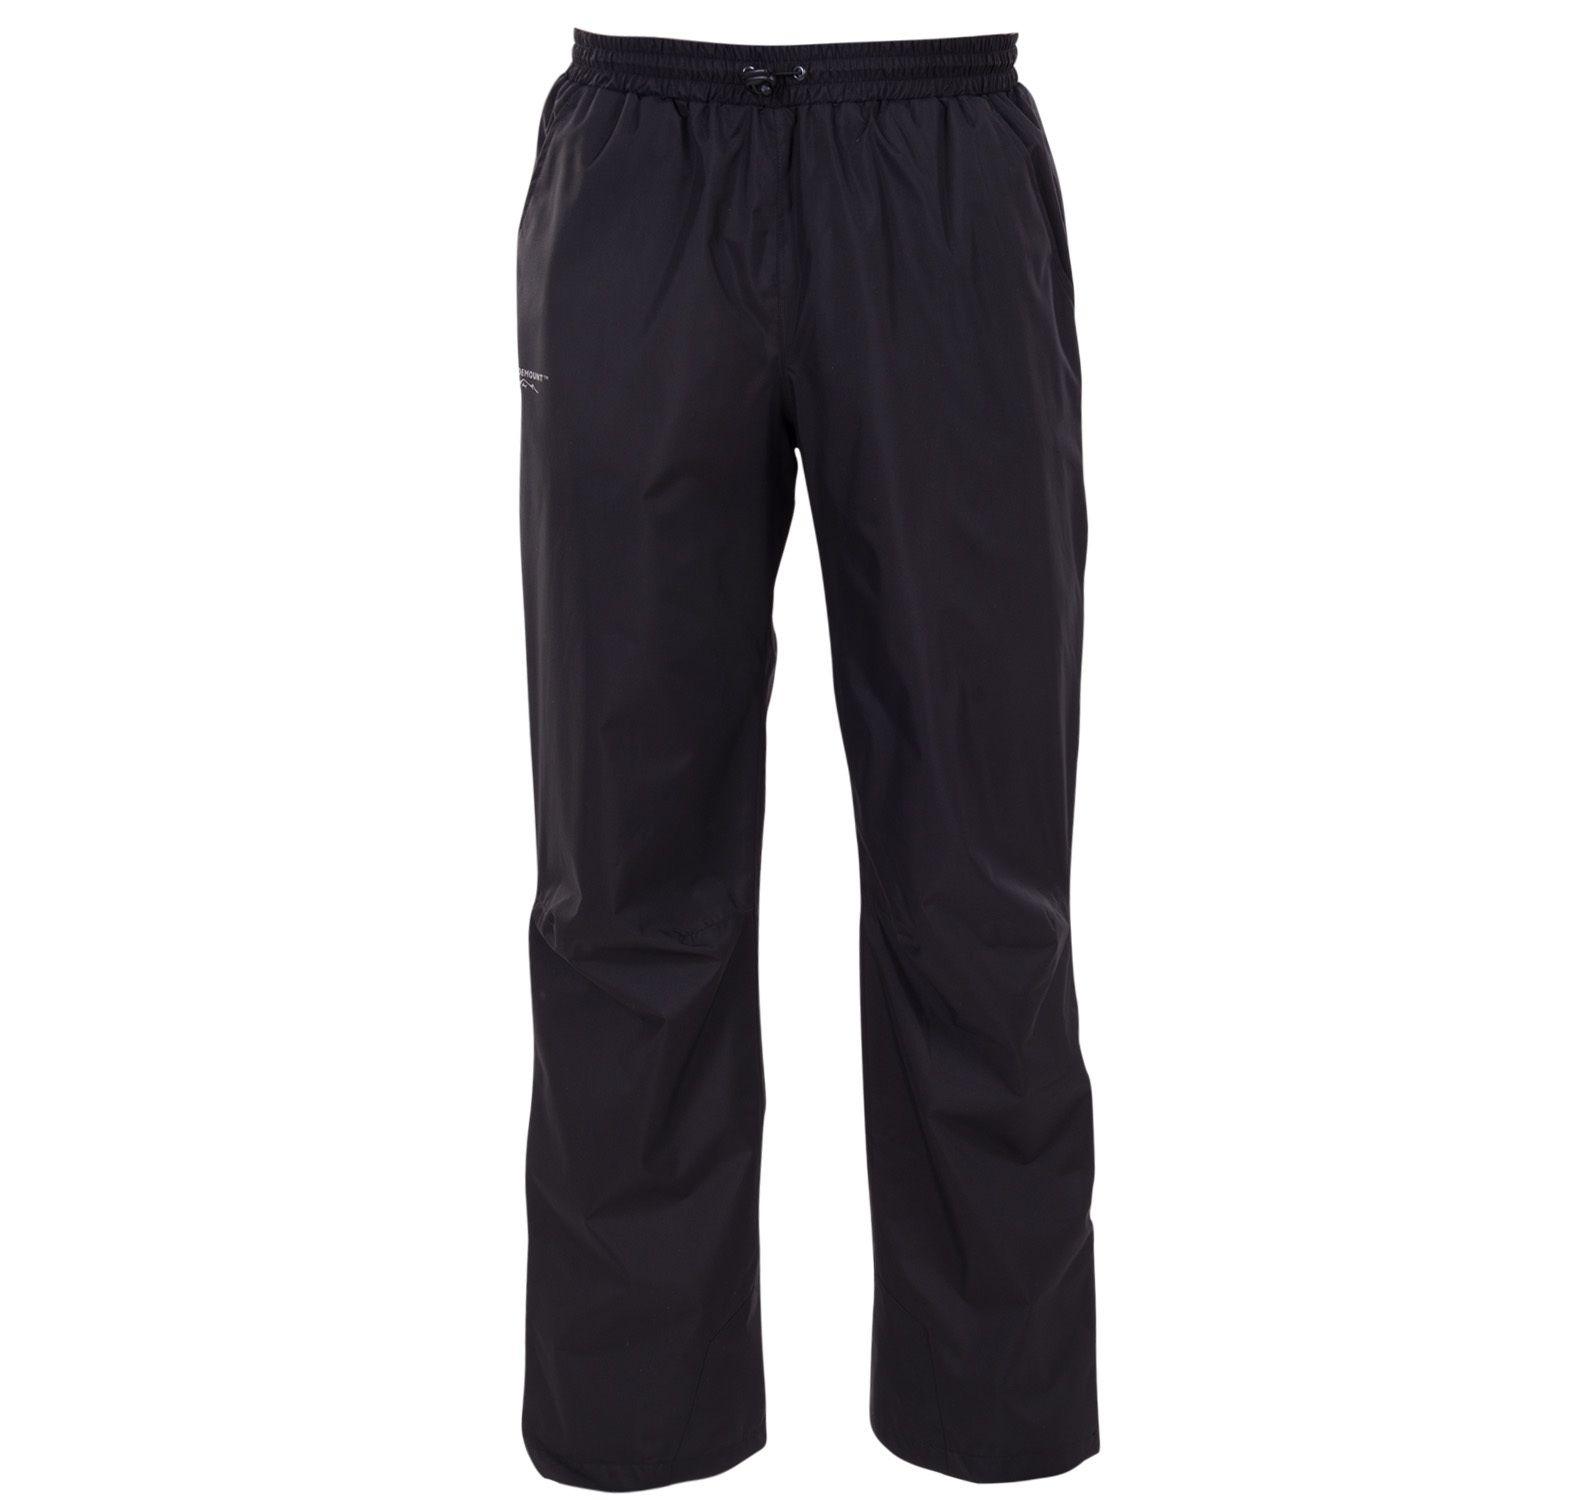 Grundsund Pant, Black, 2xl, Regnkläder